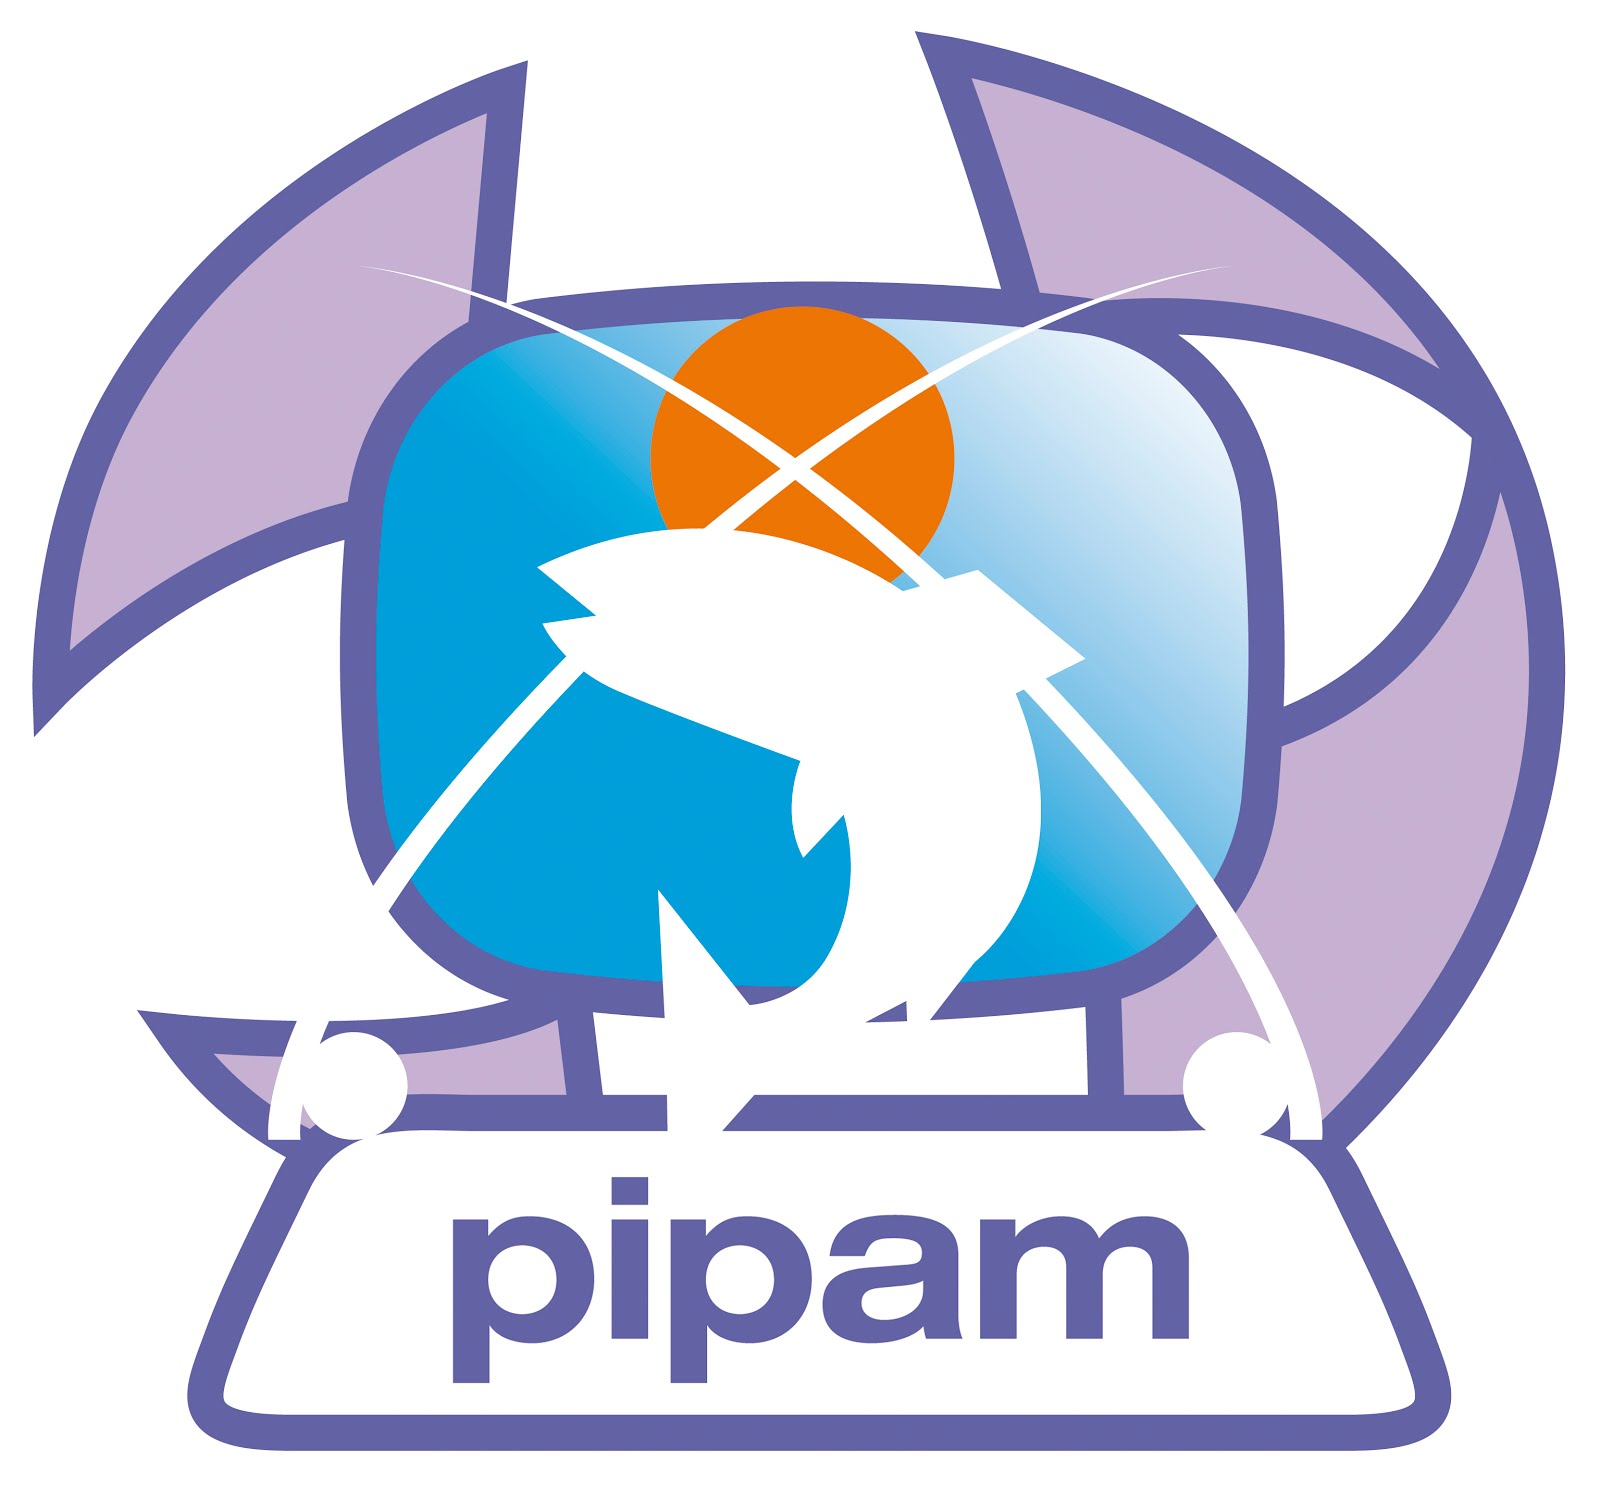 PIPAM